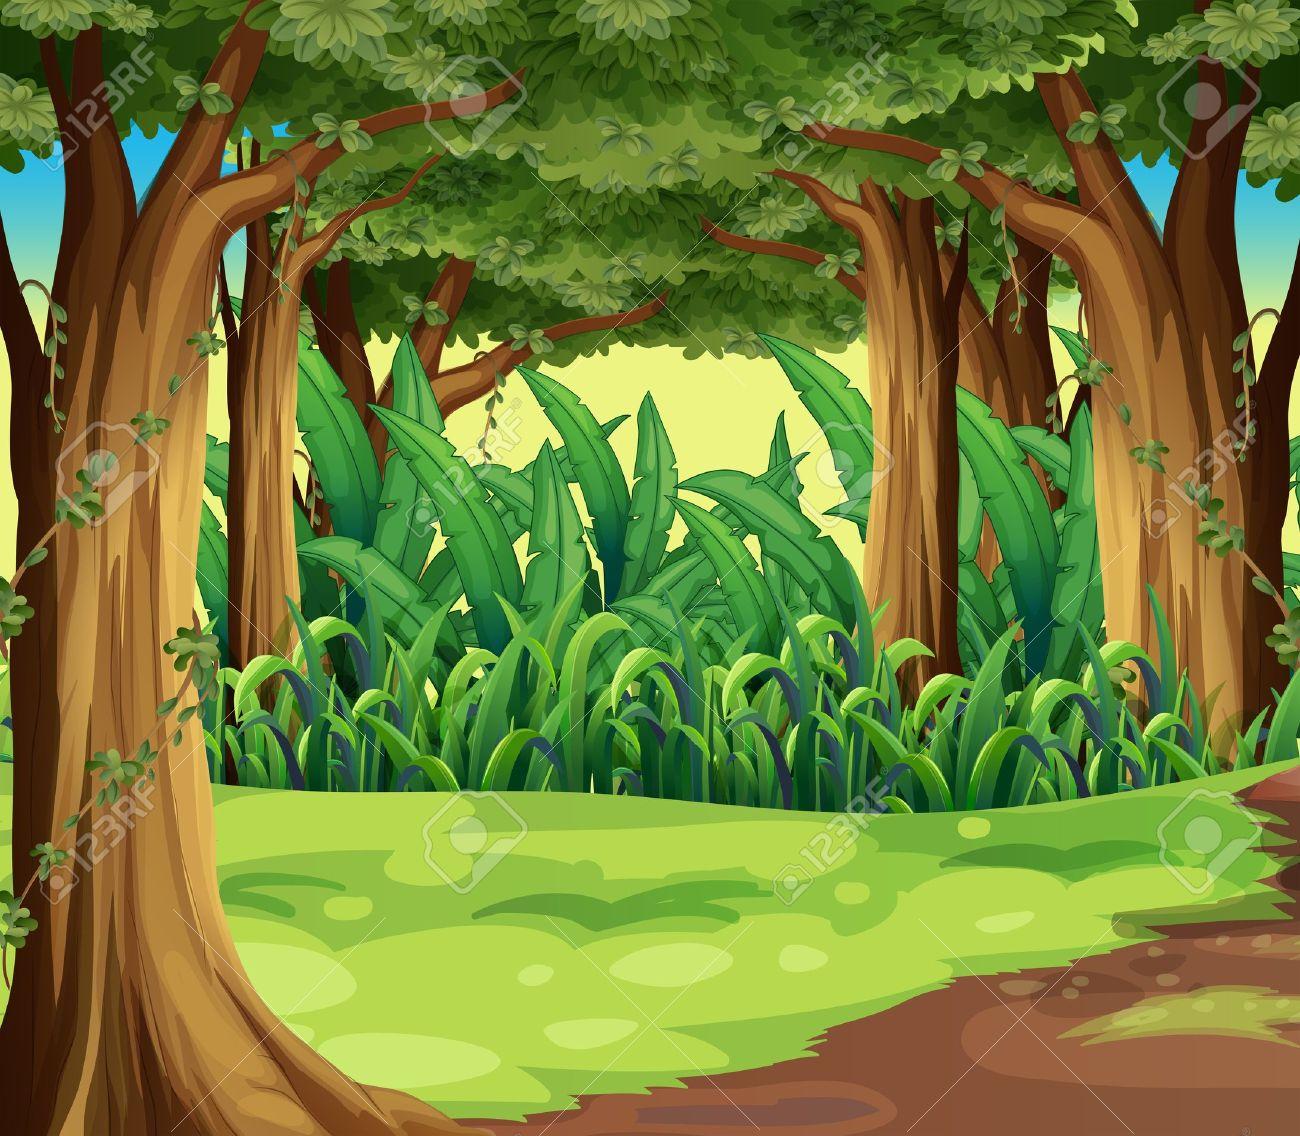 Wood clipart jungle scenery Jungle Panda Free Art Clipart